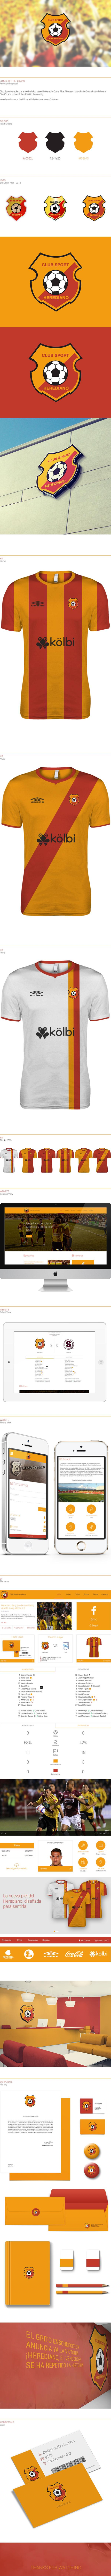 Herediano redesign umbro soccer Costa Rica Futbol team visual identity brand